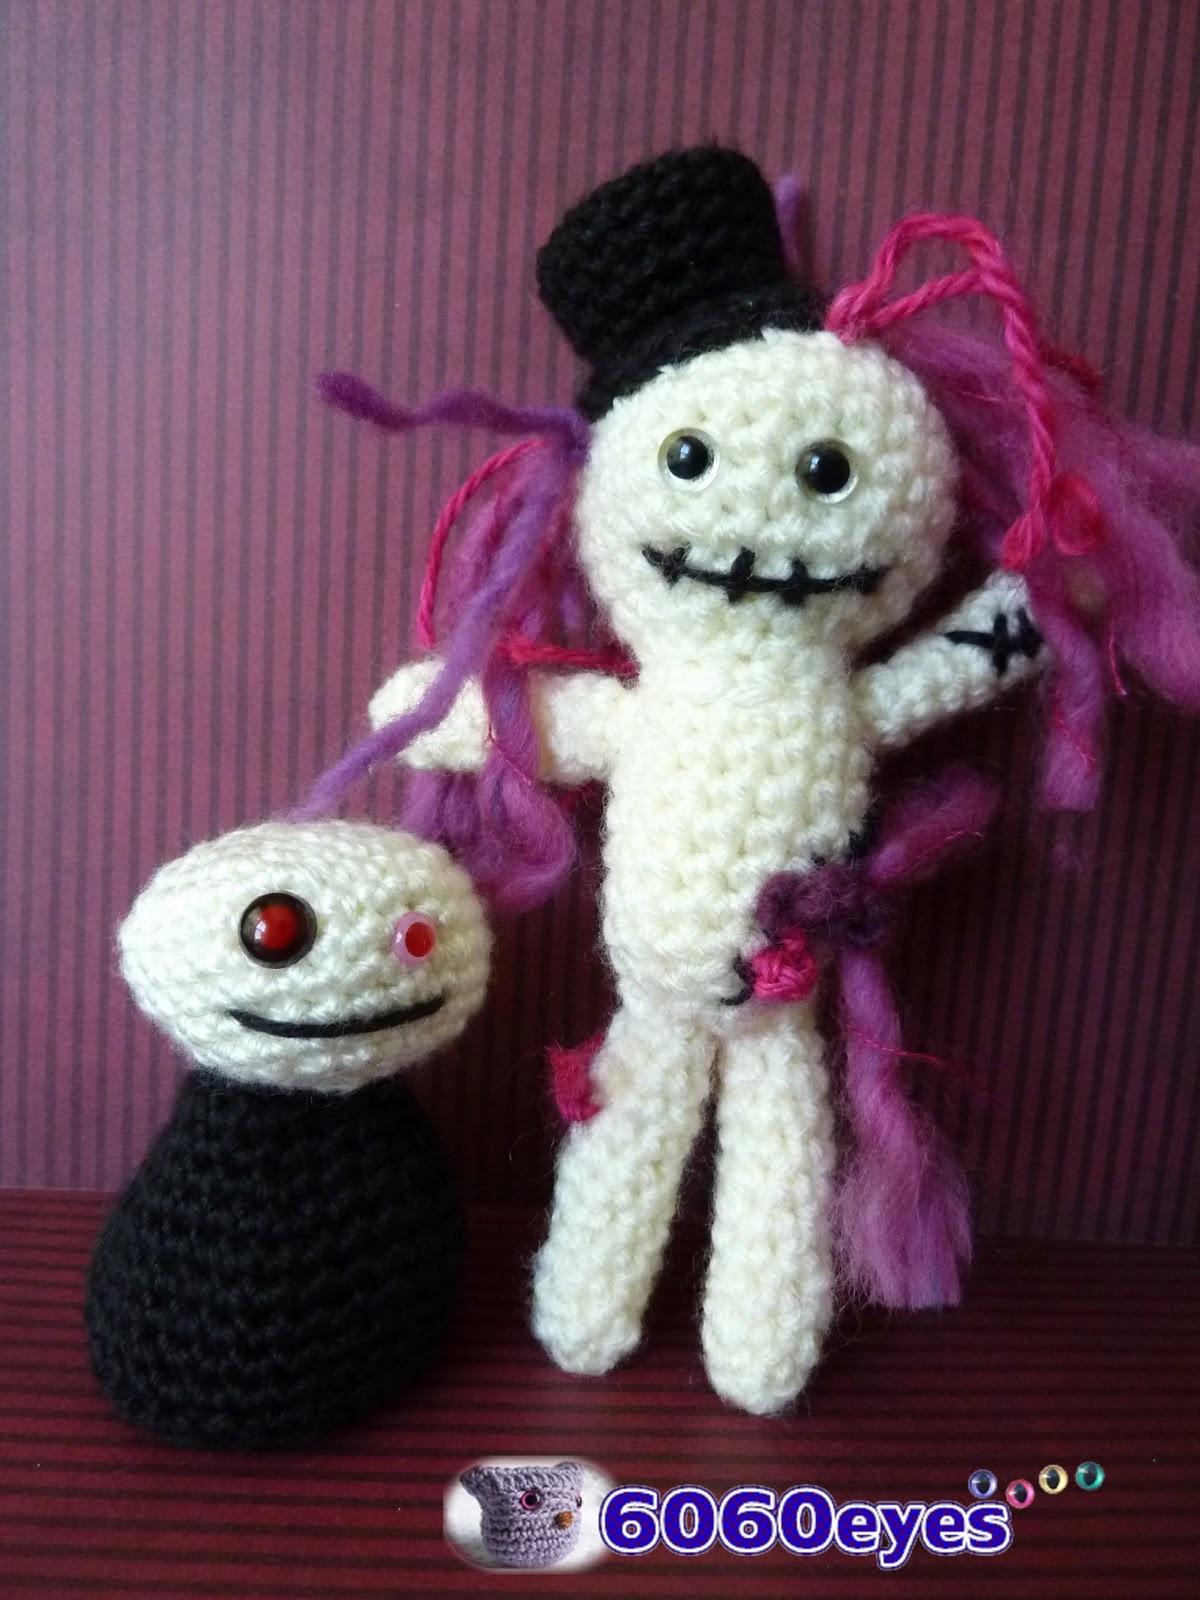 Amigurumi Patterns K And J Dolls Blog : 6060eyes.com: Crochet Zombie dolls